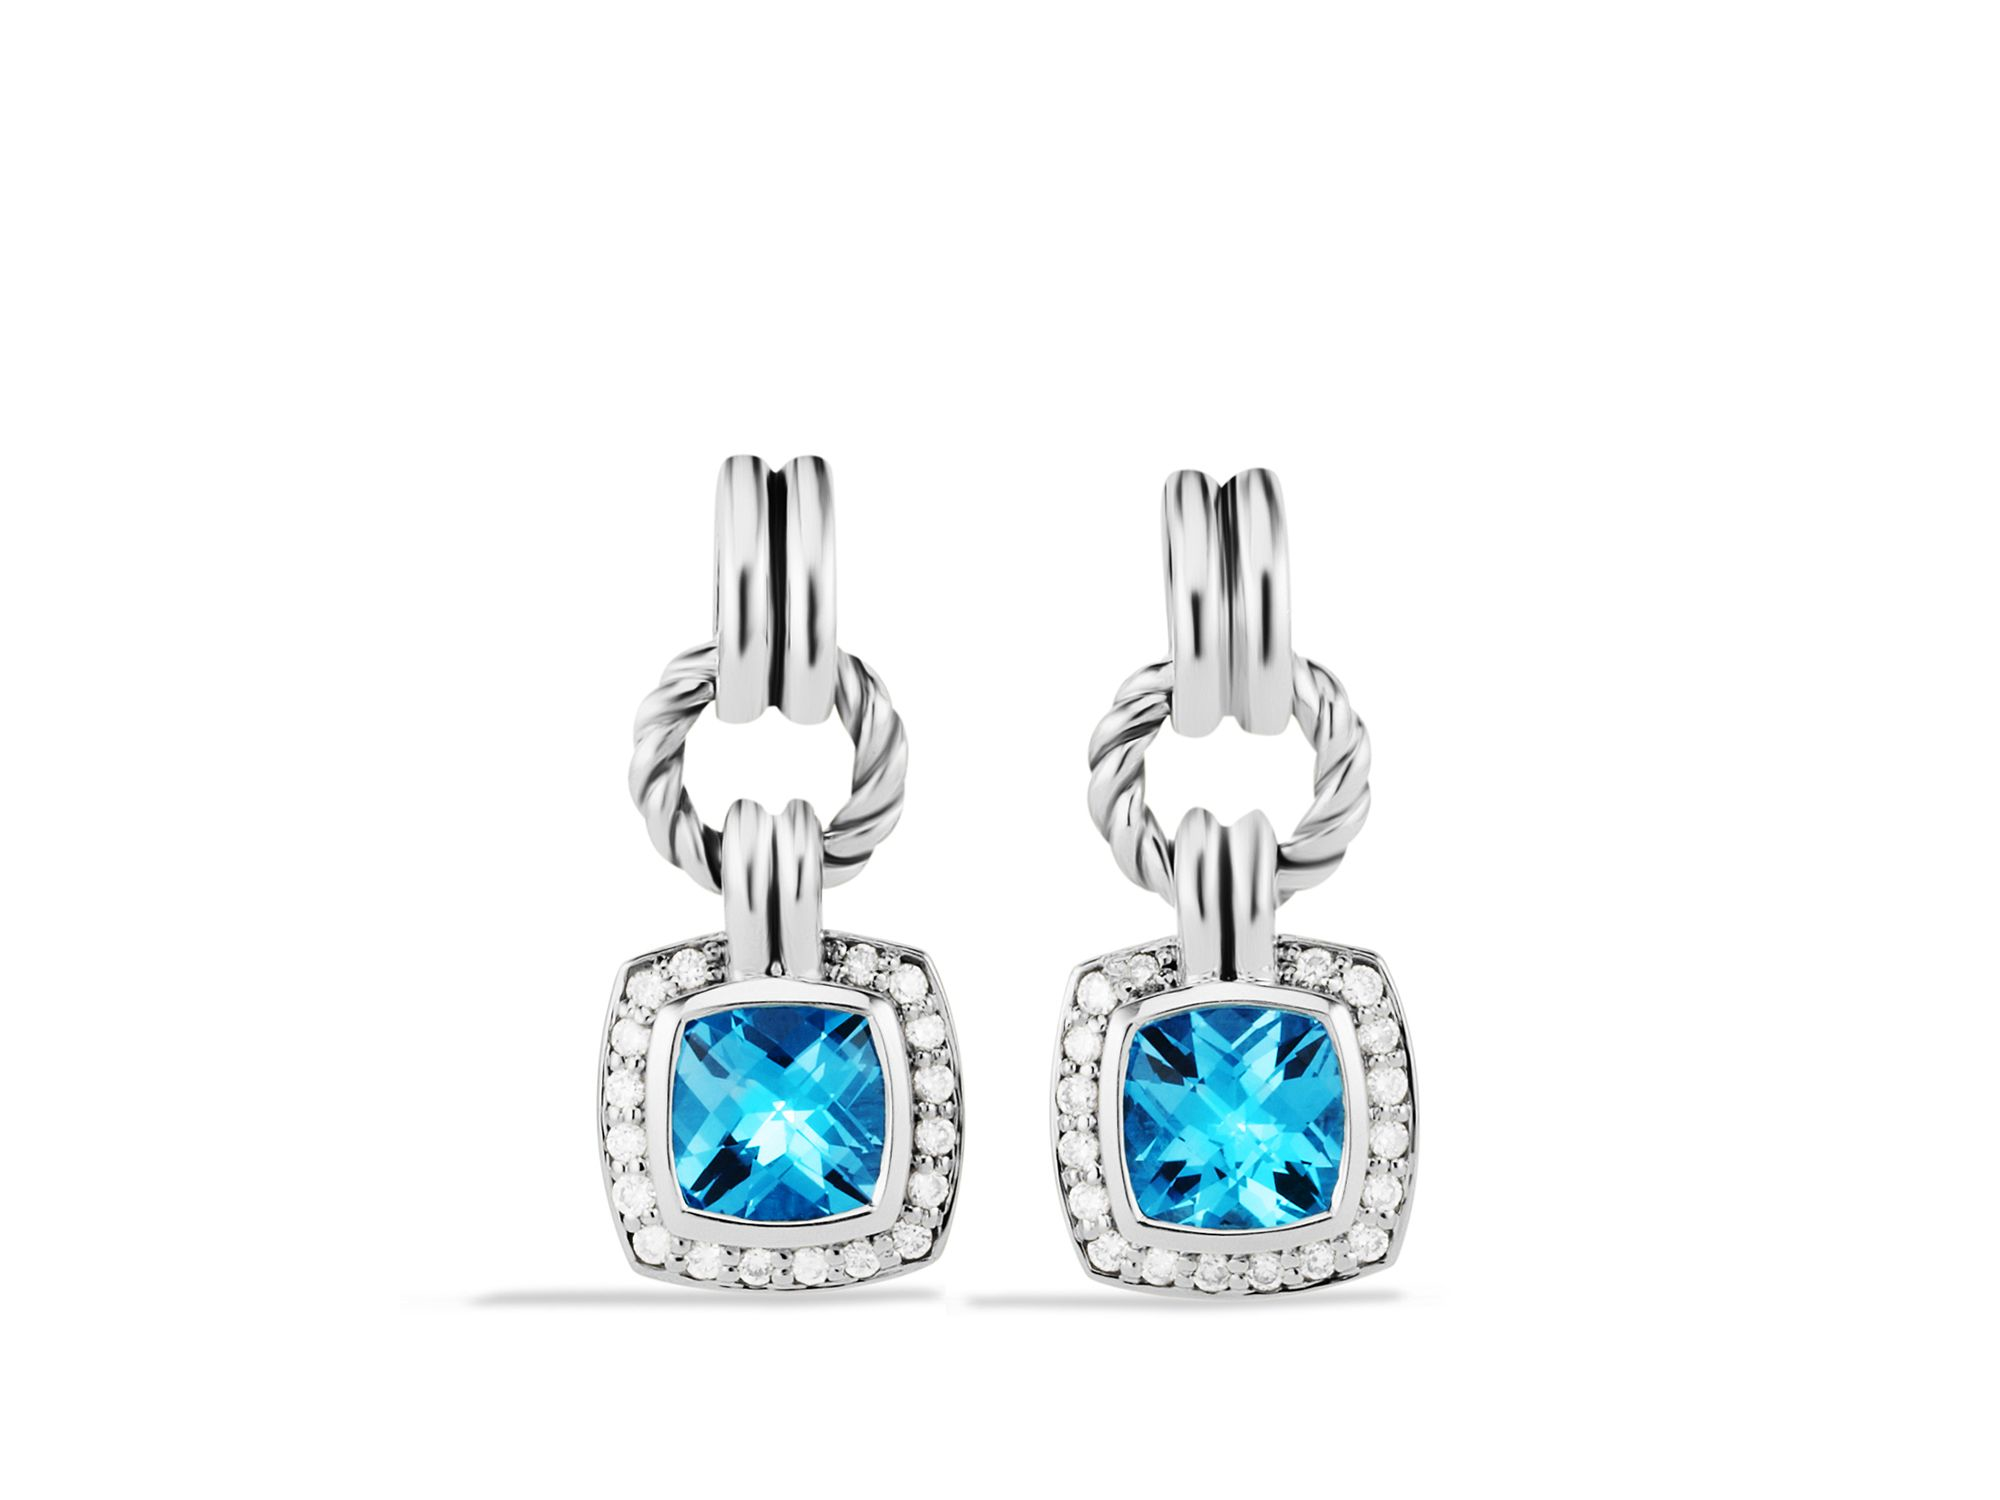 David yurman Renaissance Drop Earrings With Blue Topaz & Diamonds